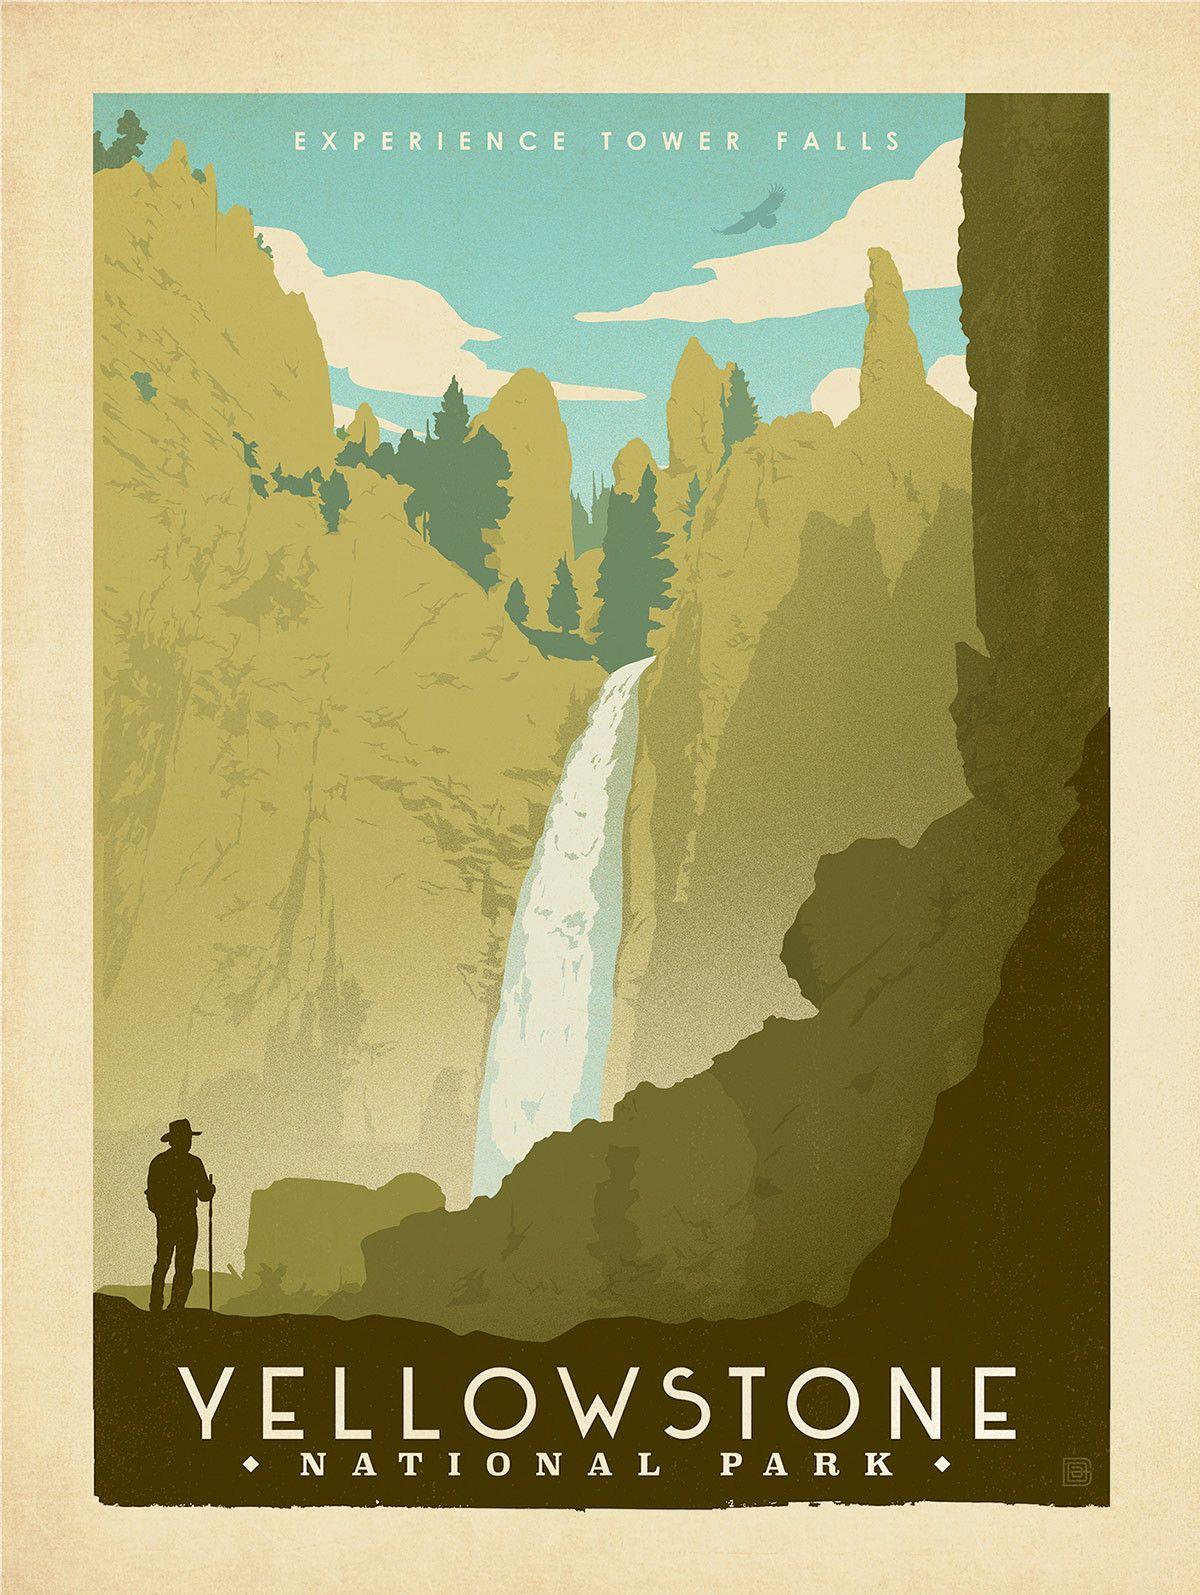 Yellowstone Falls Print National Park Posters Vintage Travel Posters Travel Posters